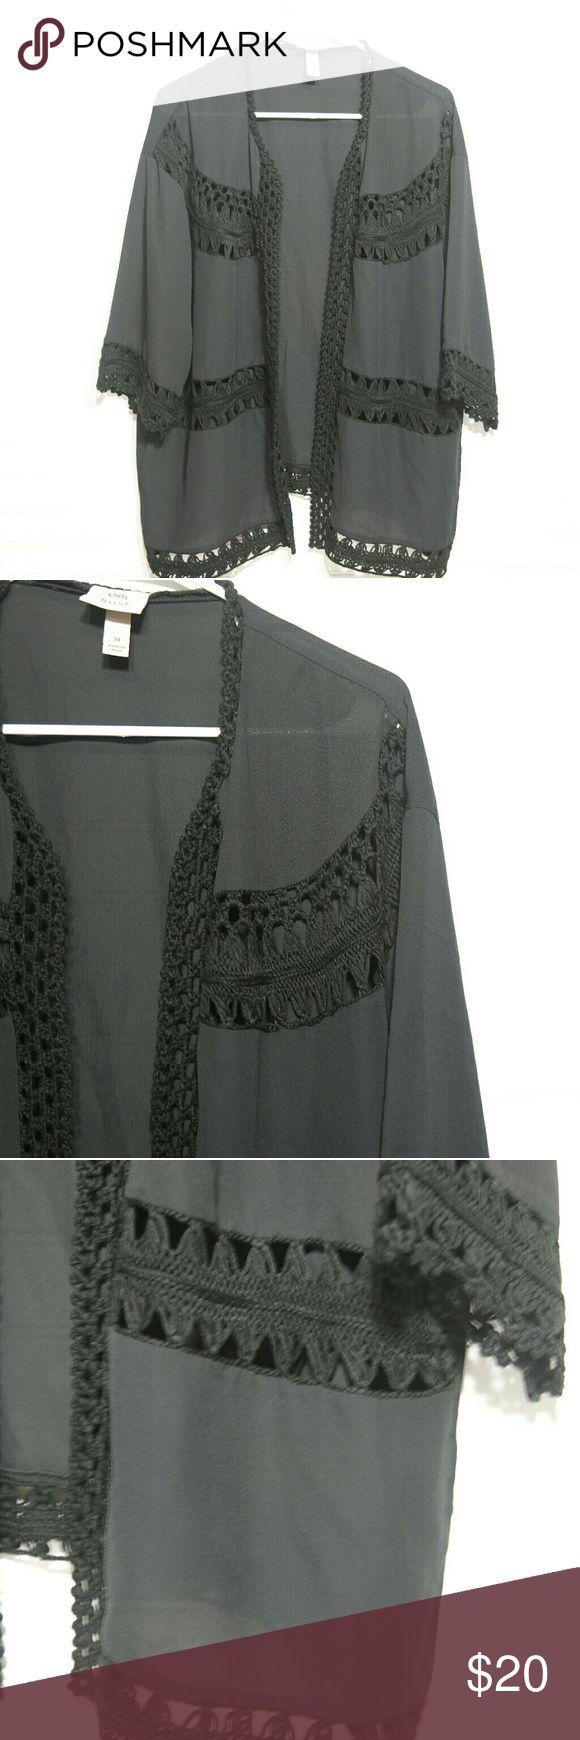 Knox Rose Women's Kimono Black Medium Preloved Black Kimono! Beautiful! Size Medium!  Approximate Length 26.5- Width 24 C9 knox rose Tops